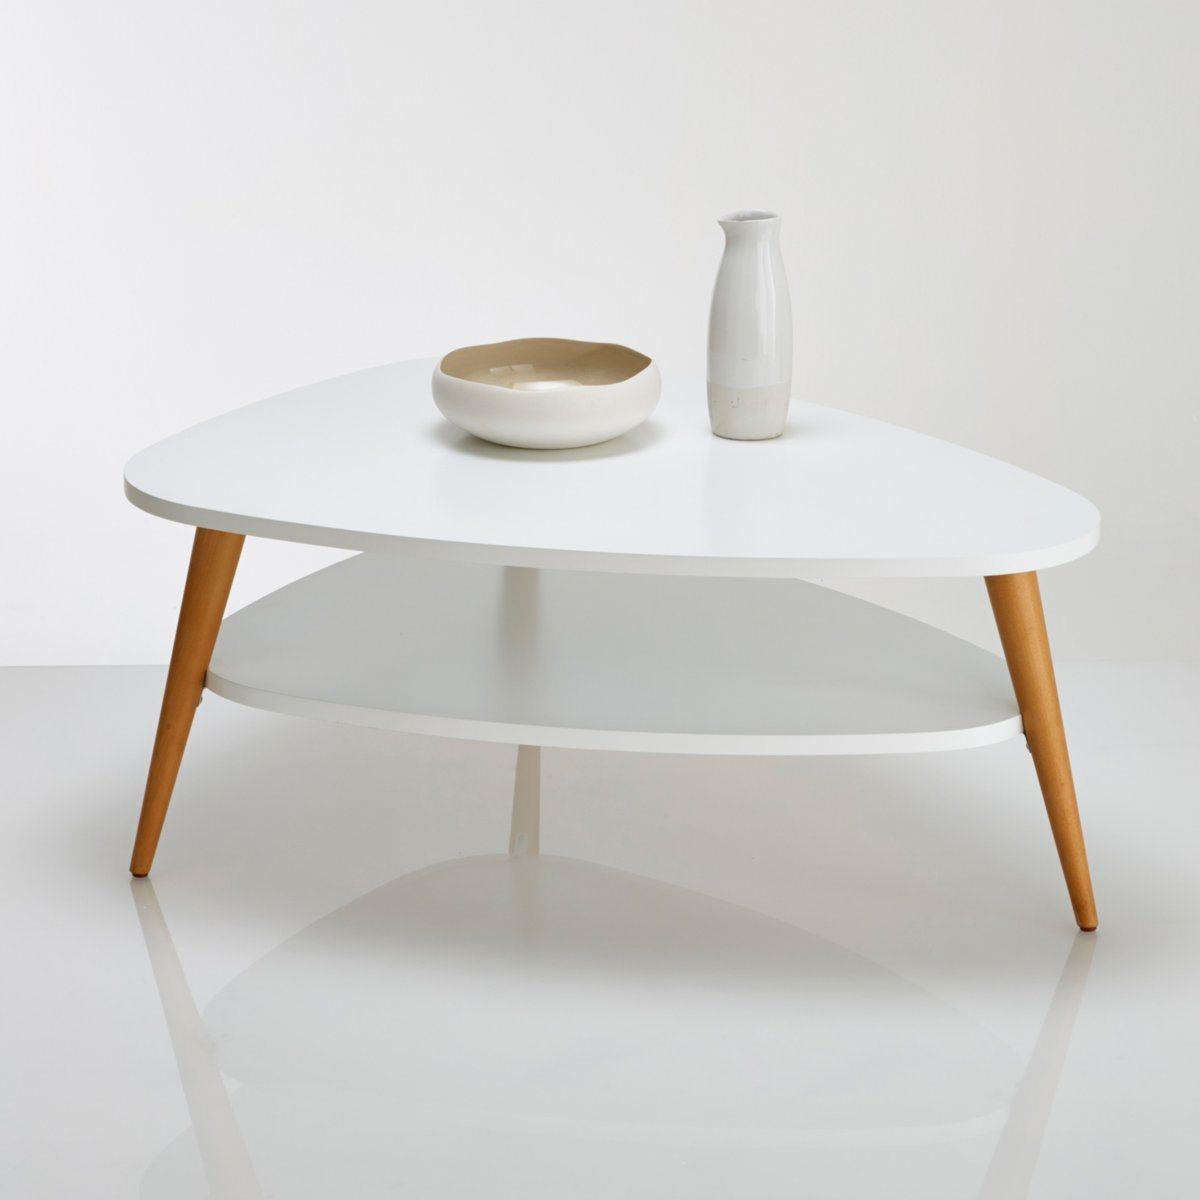 Table Basse Le Bon Coin.Le Bon Coin Table Basse Scandinave Mobilier Design